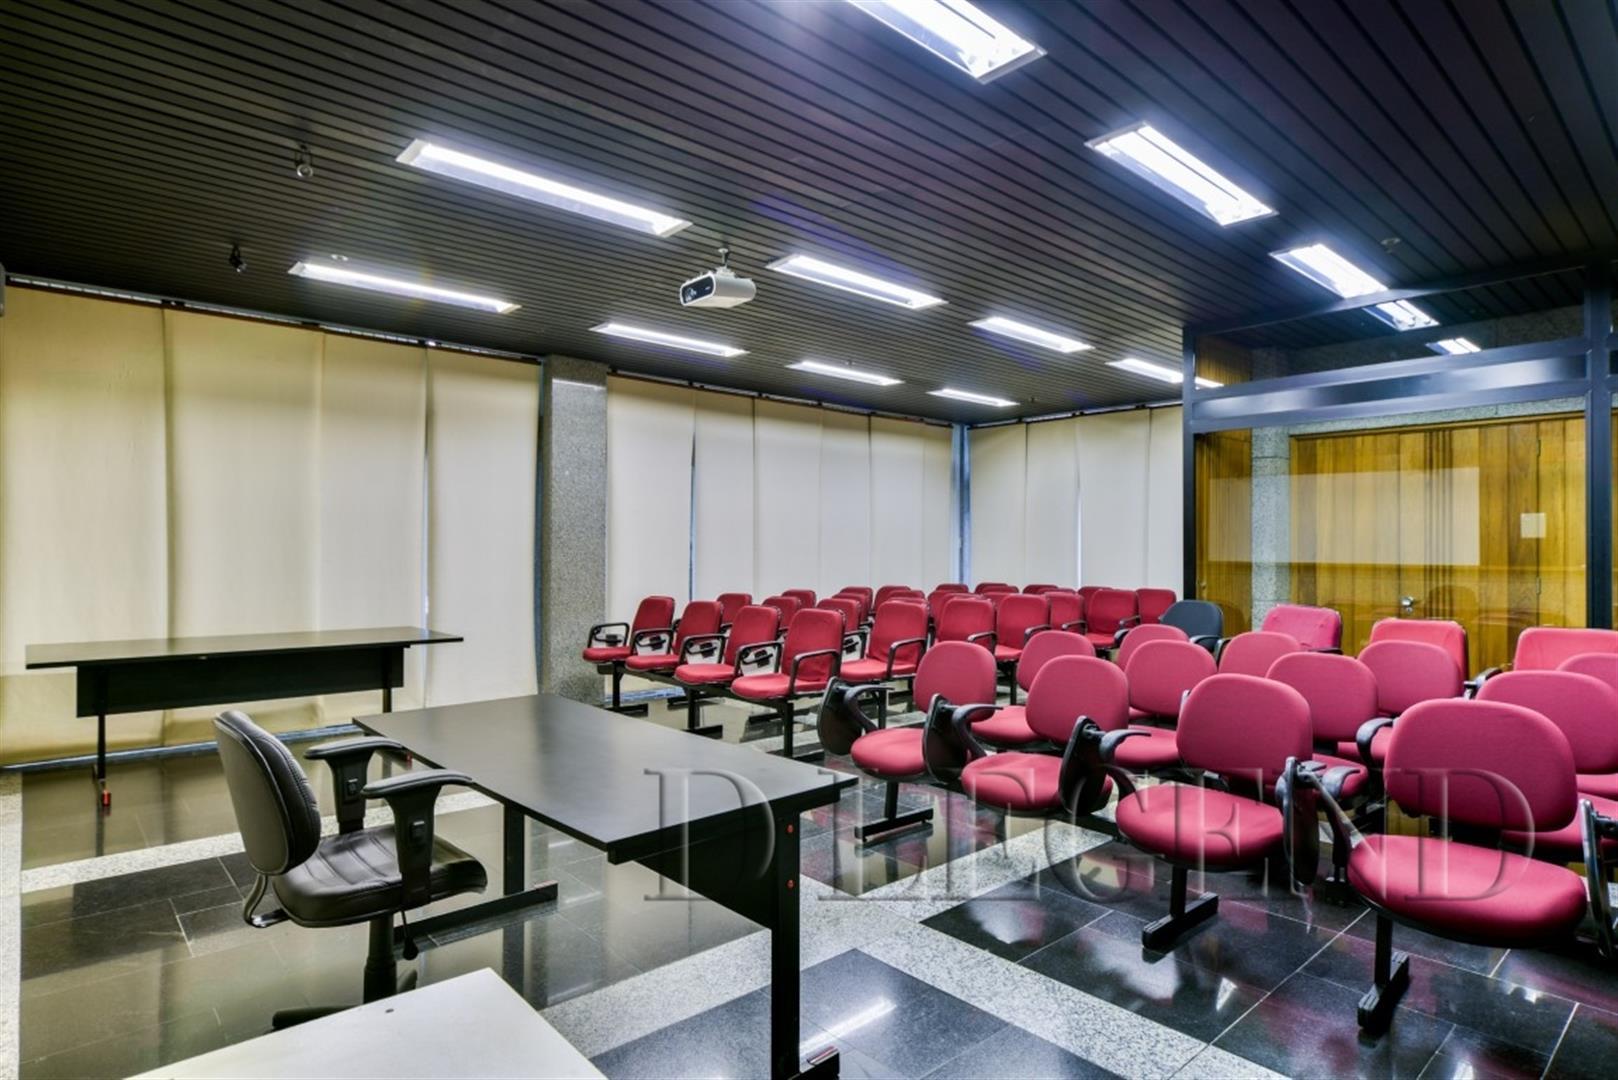 Centro Empresarial Presidente Kennedy - Avenida Carlos Gomes, 111 - Auxiliadora - PORTO ALEGRE